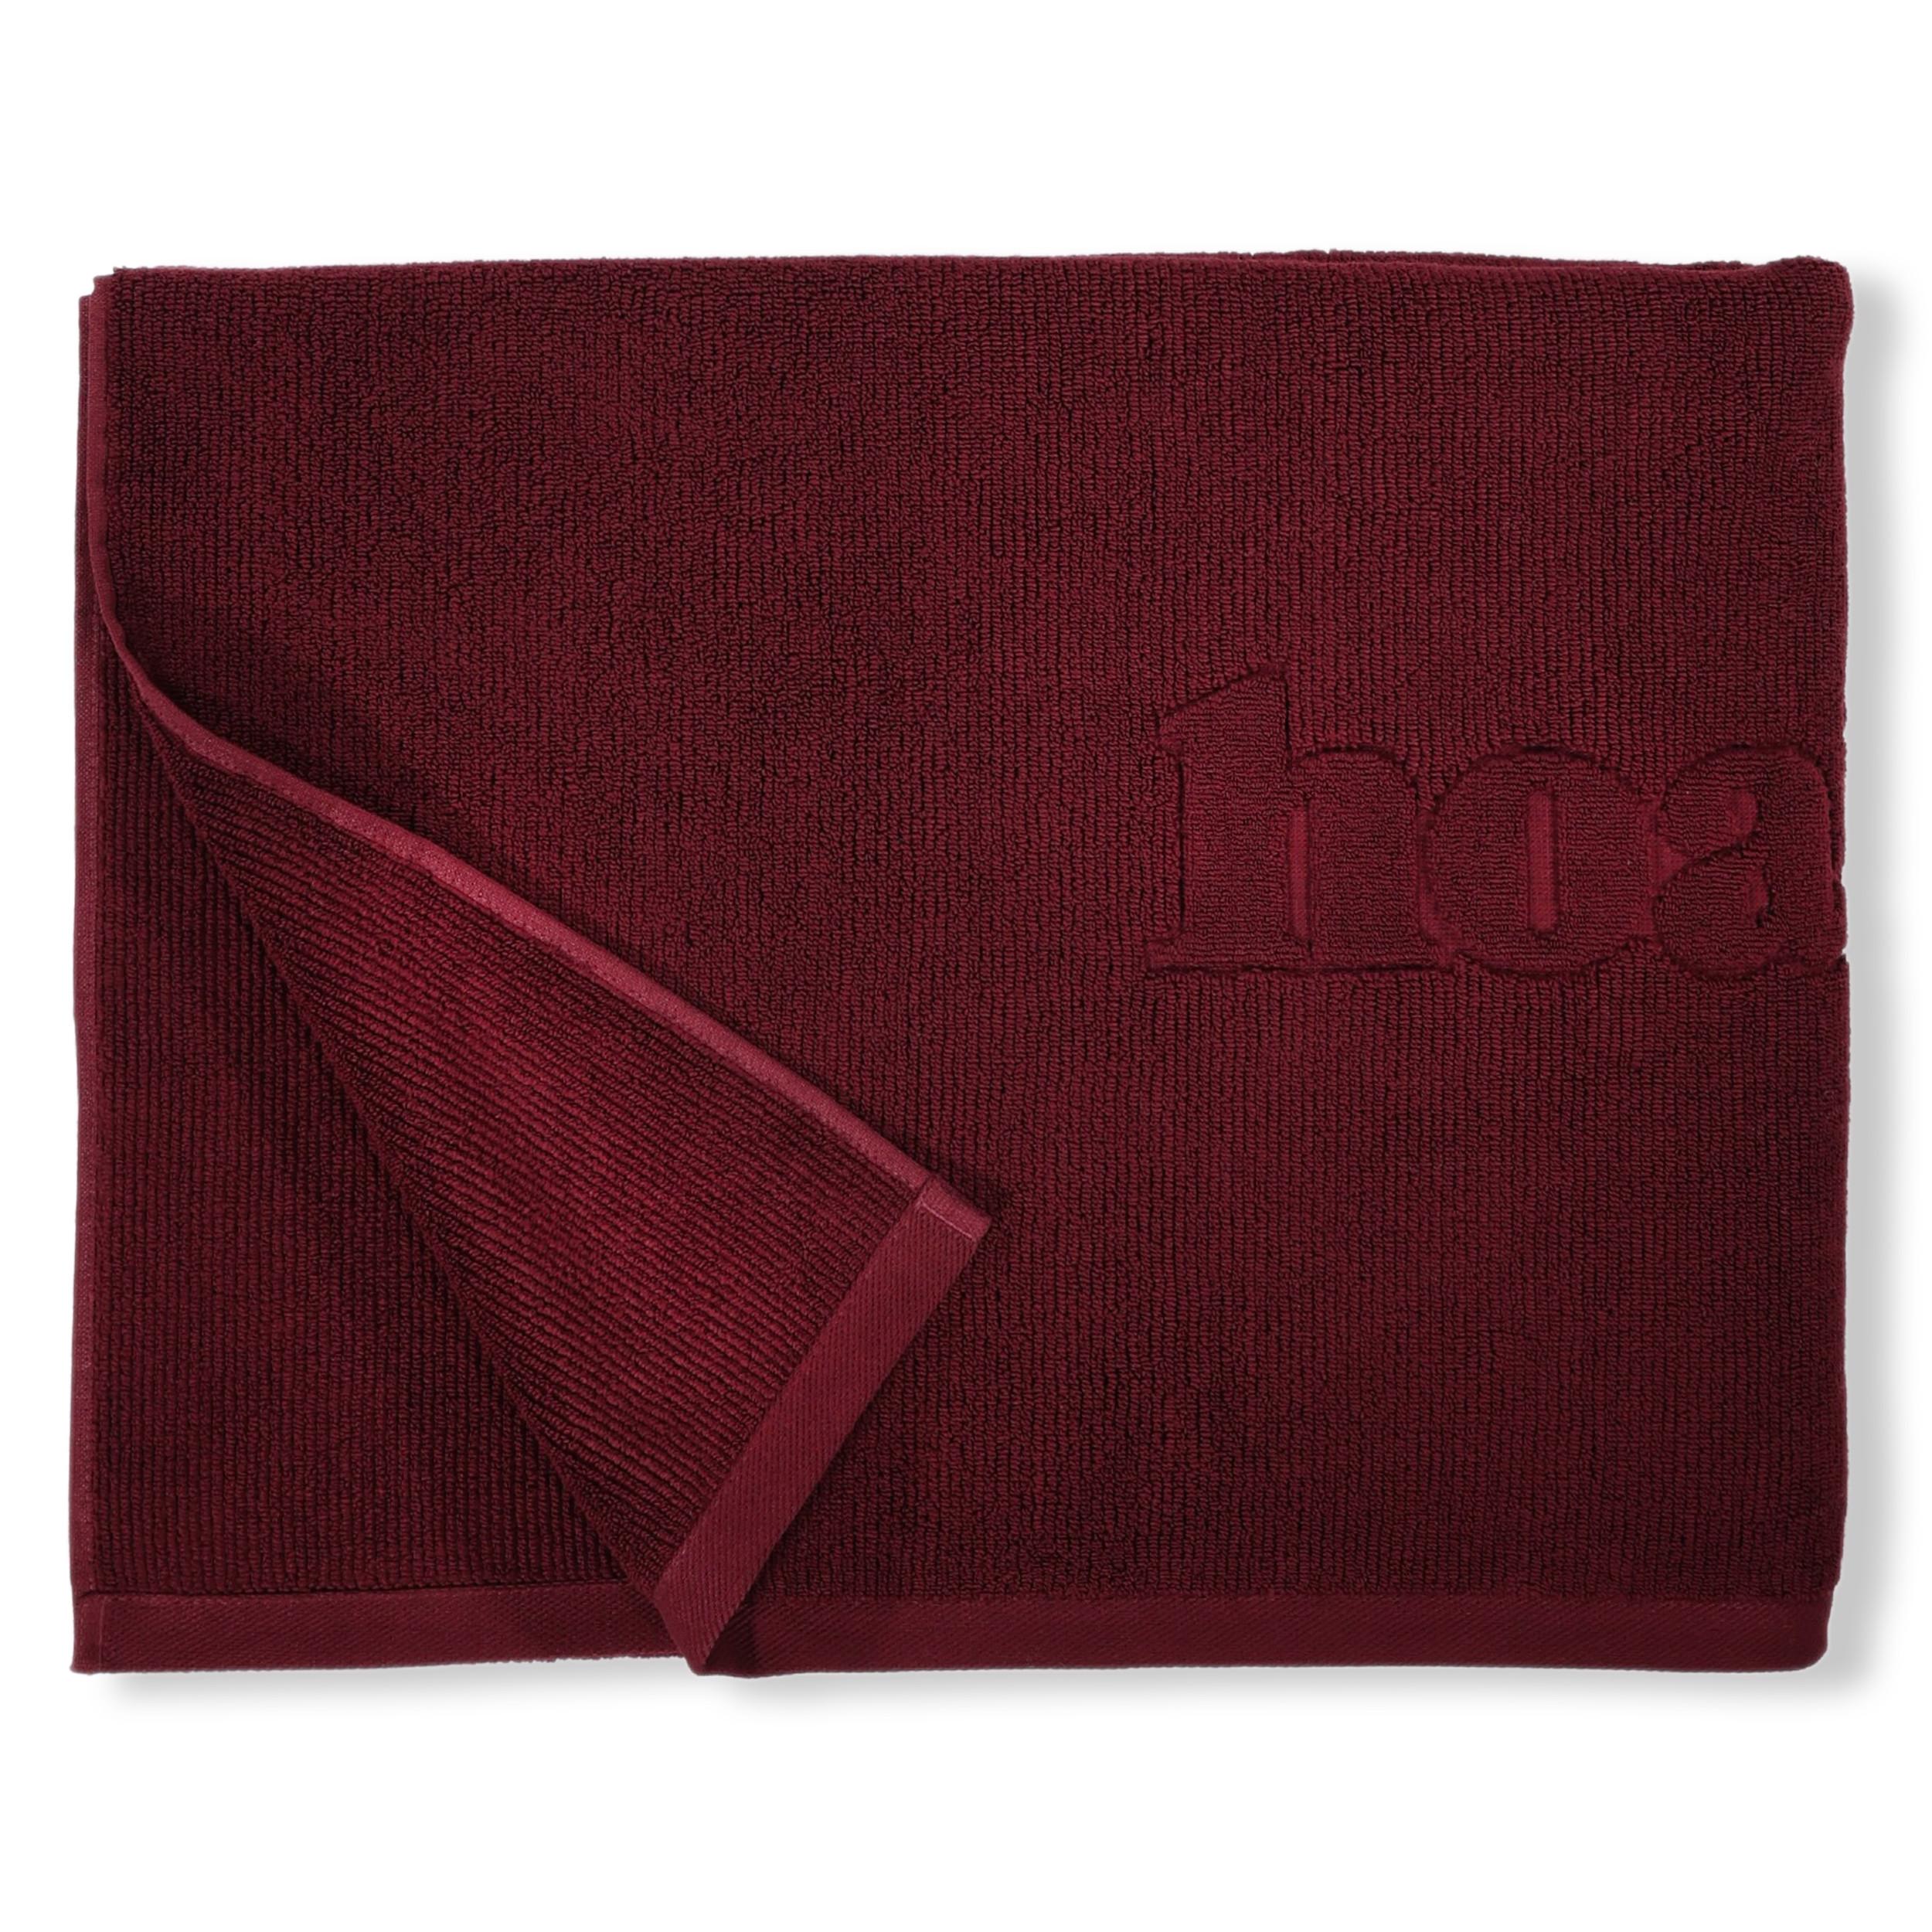 Thick bath towel